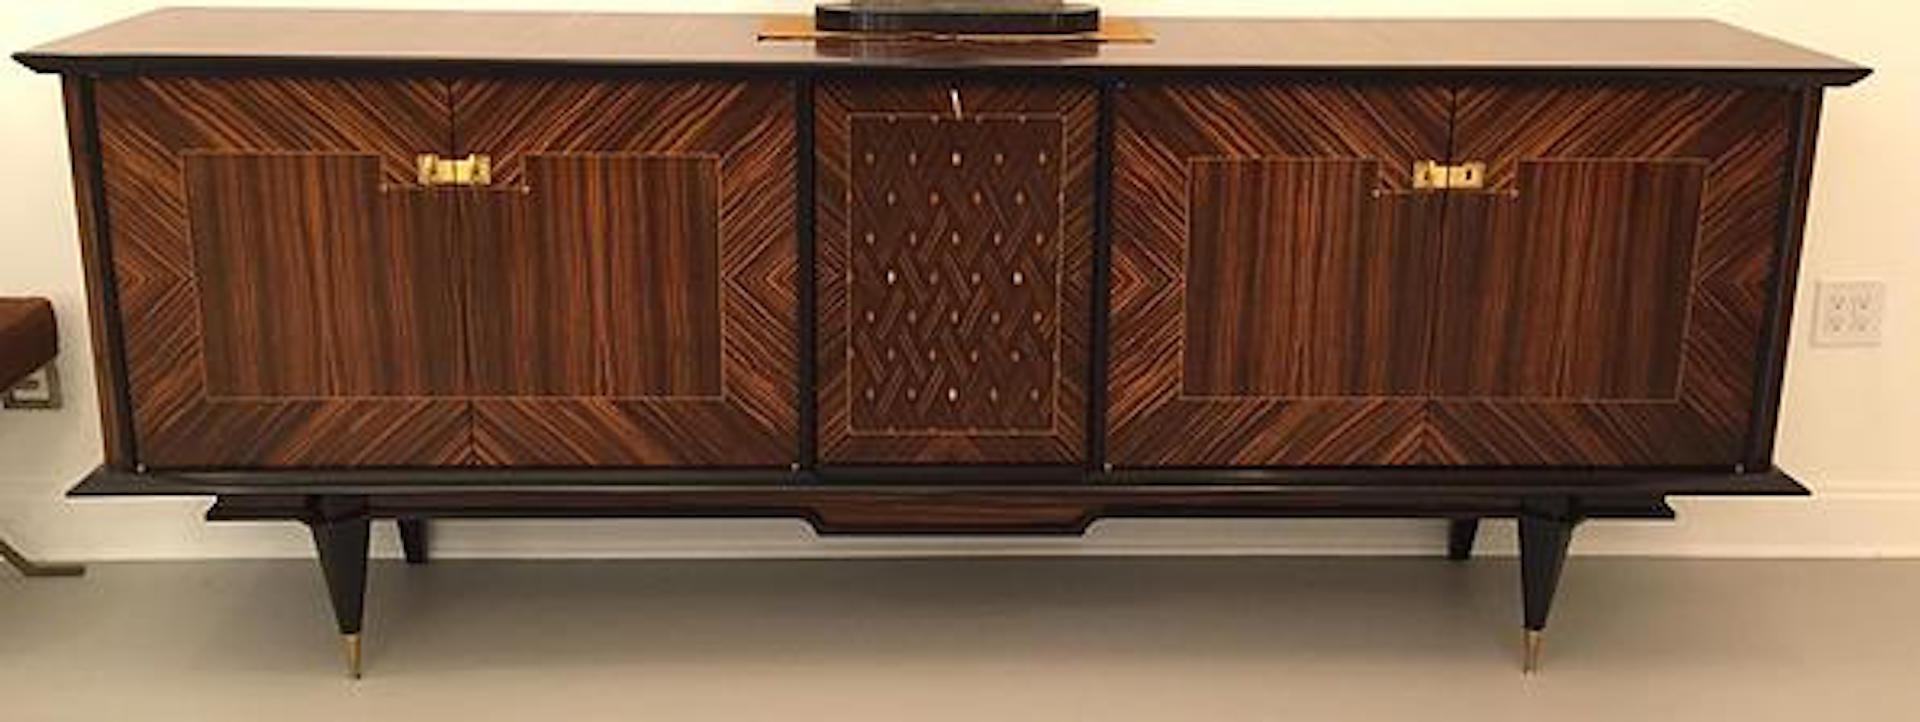 french art deco exotic macassar ebony buffet modernism. Black Bedroom Furniture Sets. Home Design Ideas